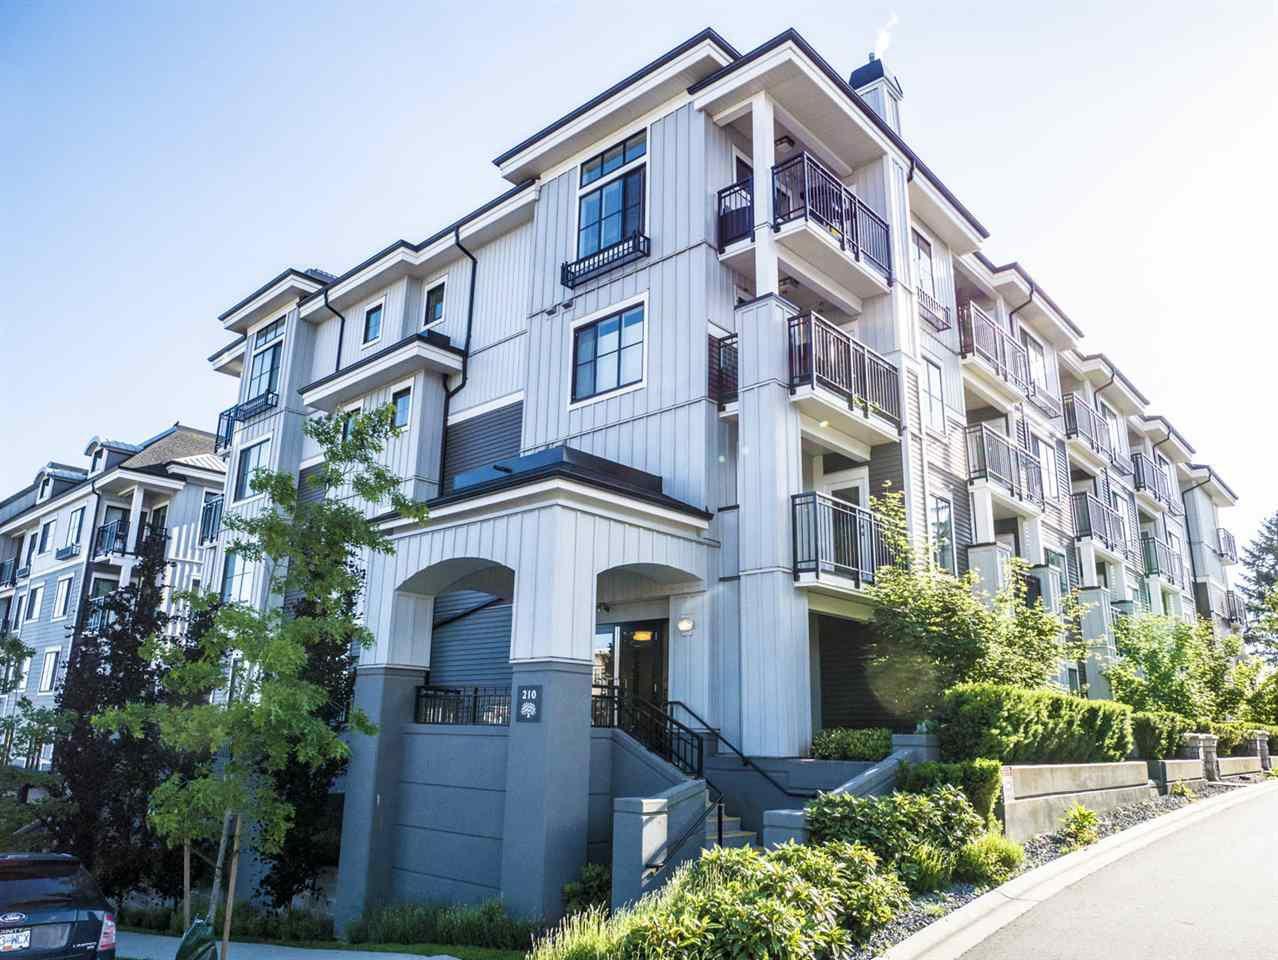 Main Photo: 108 210 LEBLEU Street in Coquitlam: Maillardville Condo for sale : MLS®# R2174151